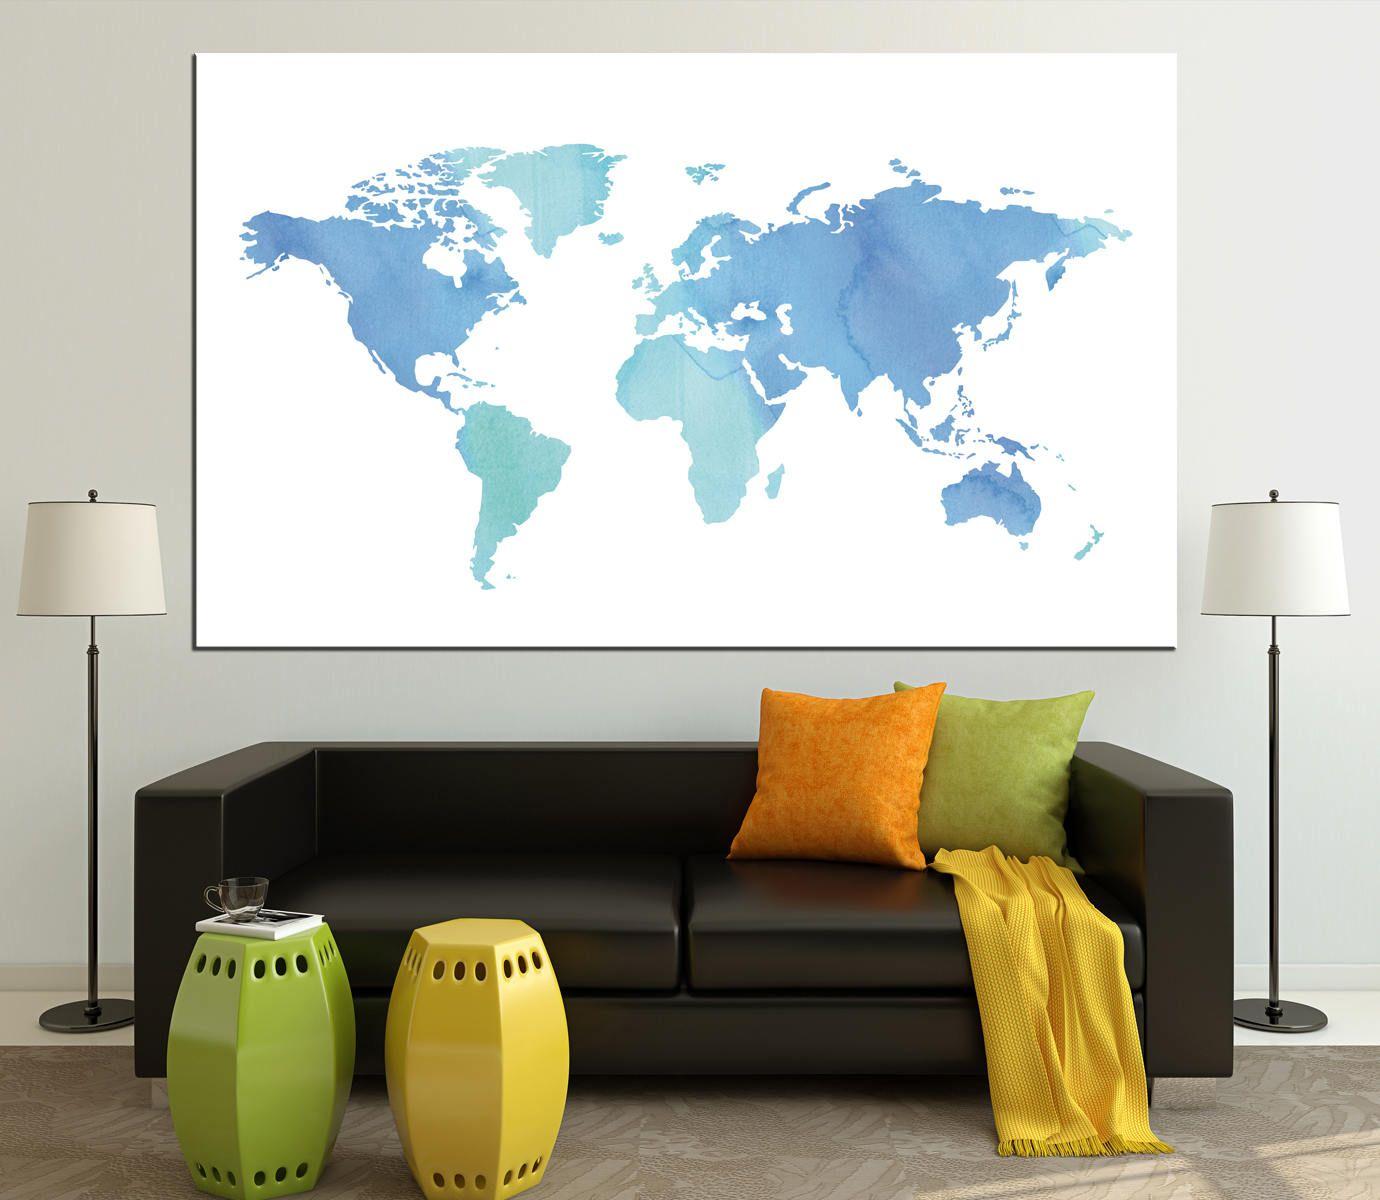 Blue watercolor large world map canvas panels set ready to hang blue watercolor large world map canvas panels set ready to hangmodern abstract world map gumiabroncs Images